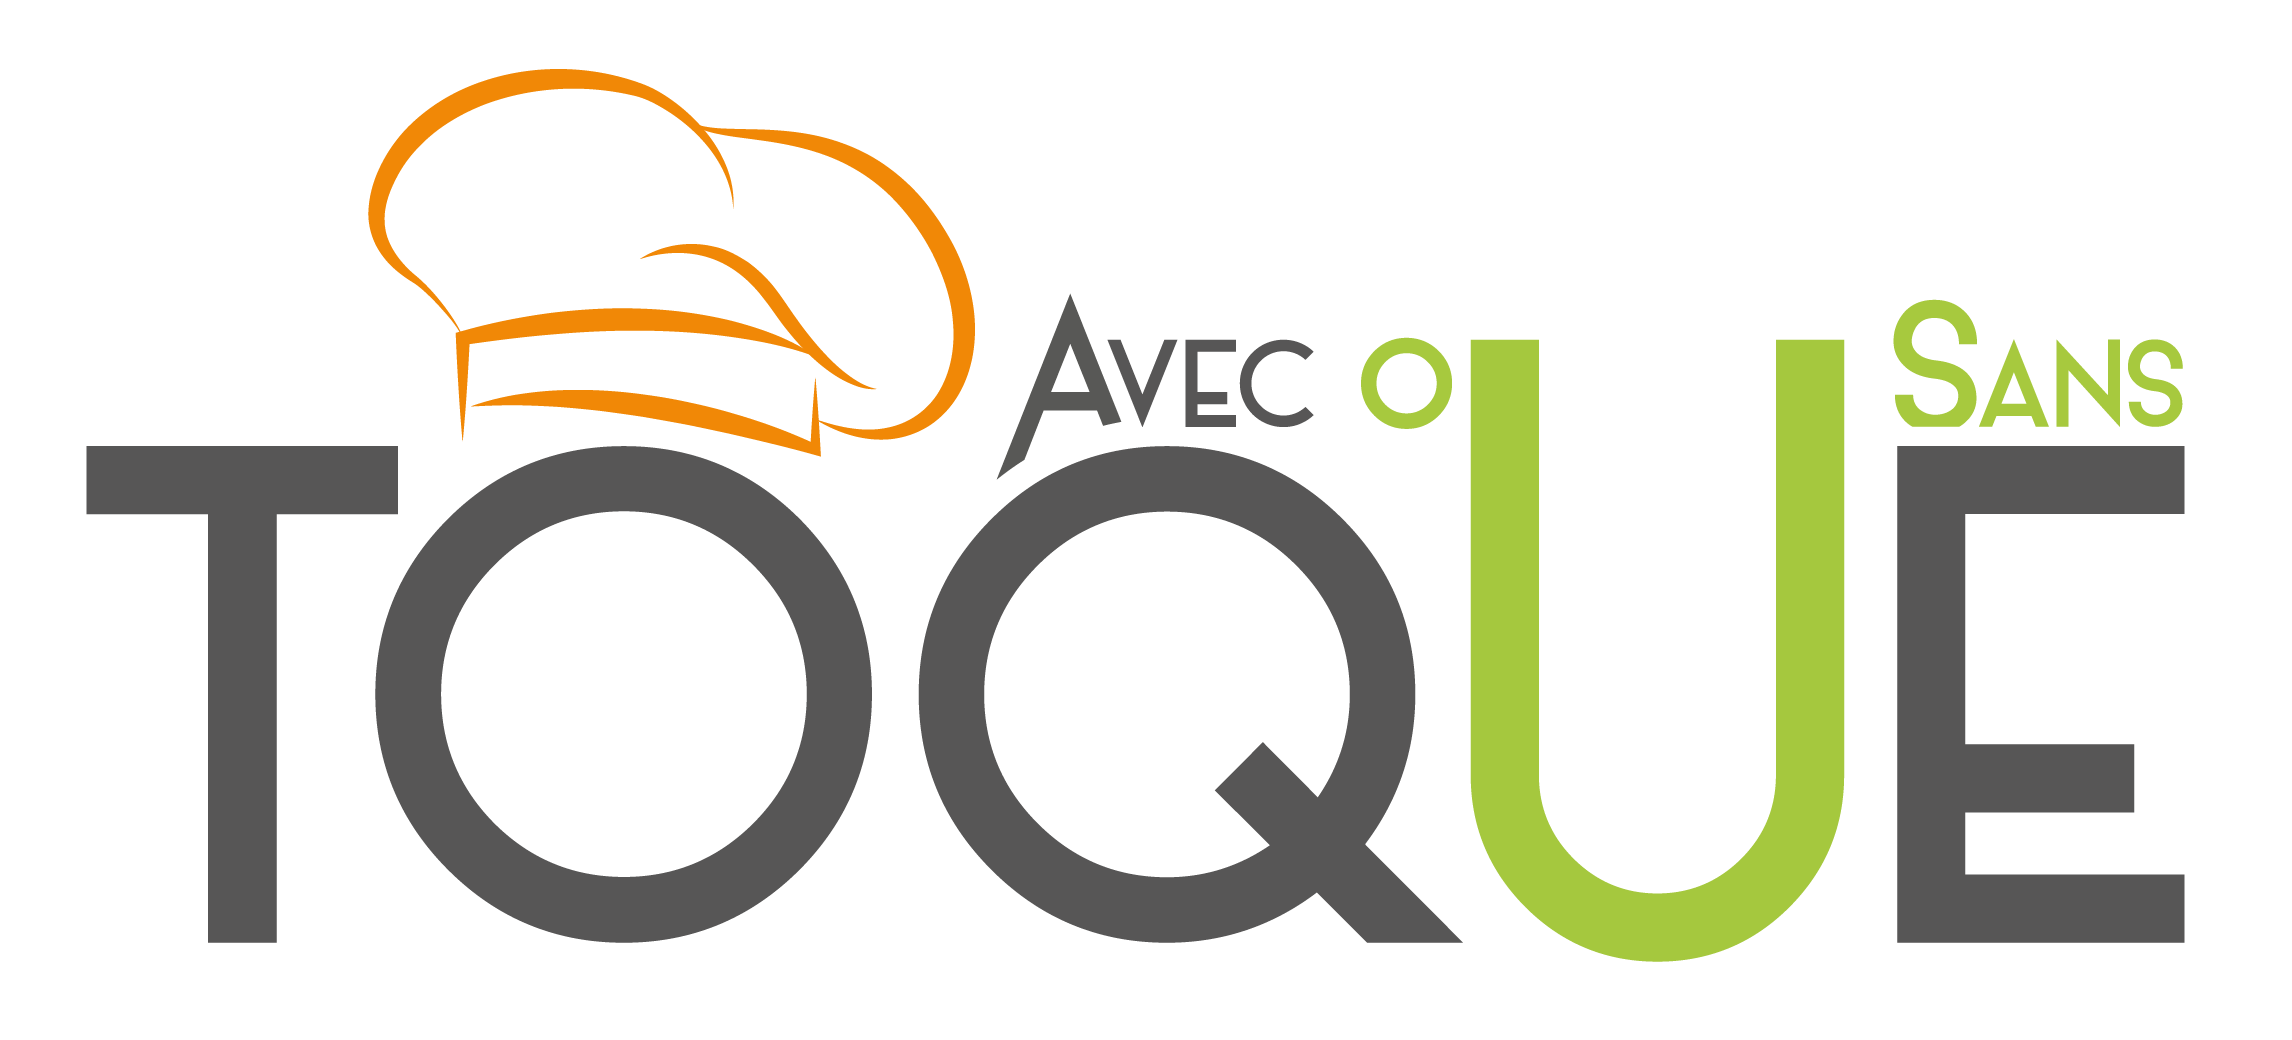 Logo Avec ou sans toque